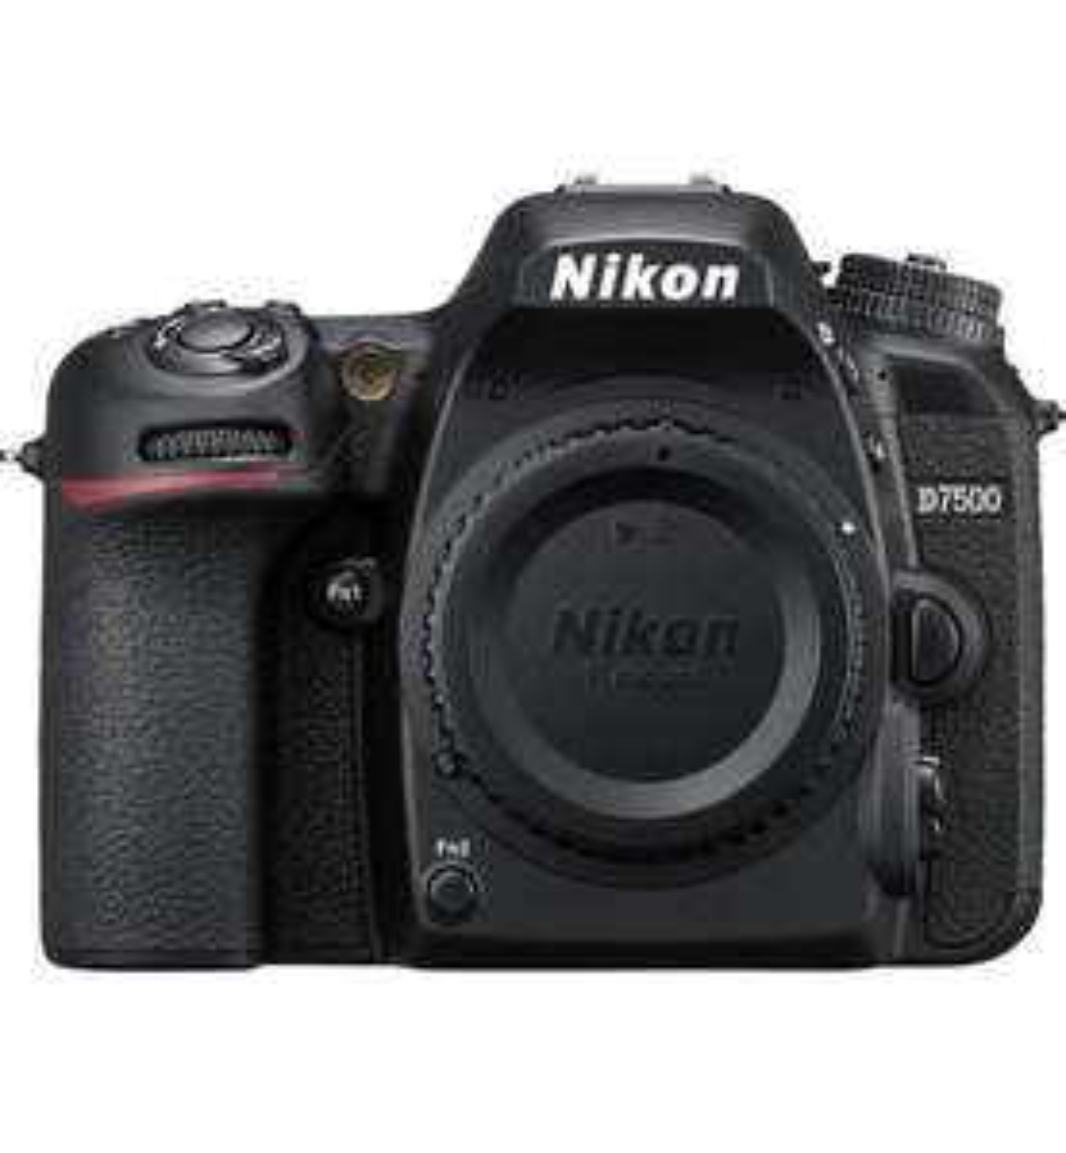 Nikon D7500 @ digitalland